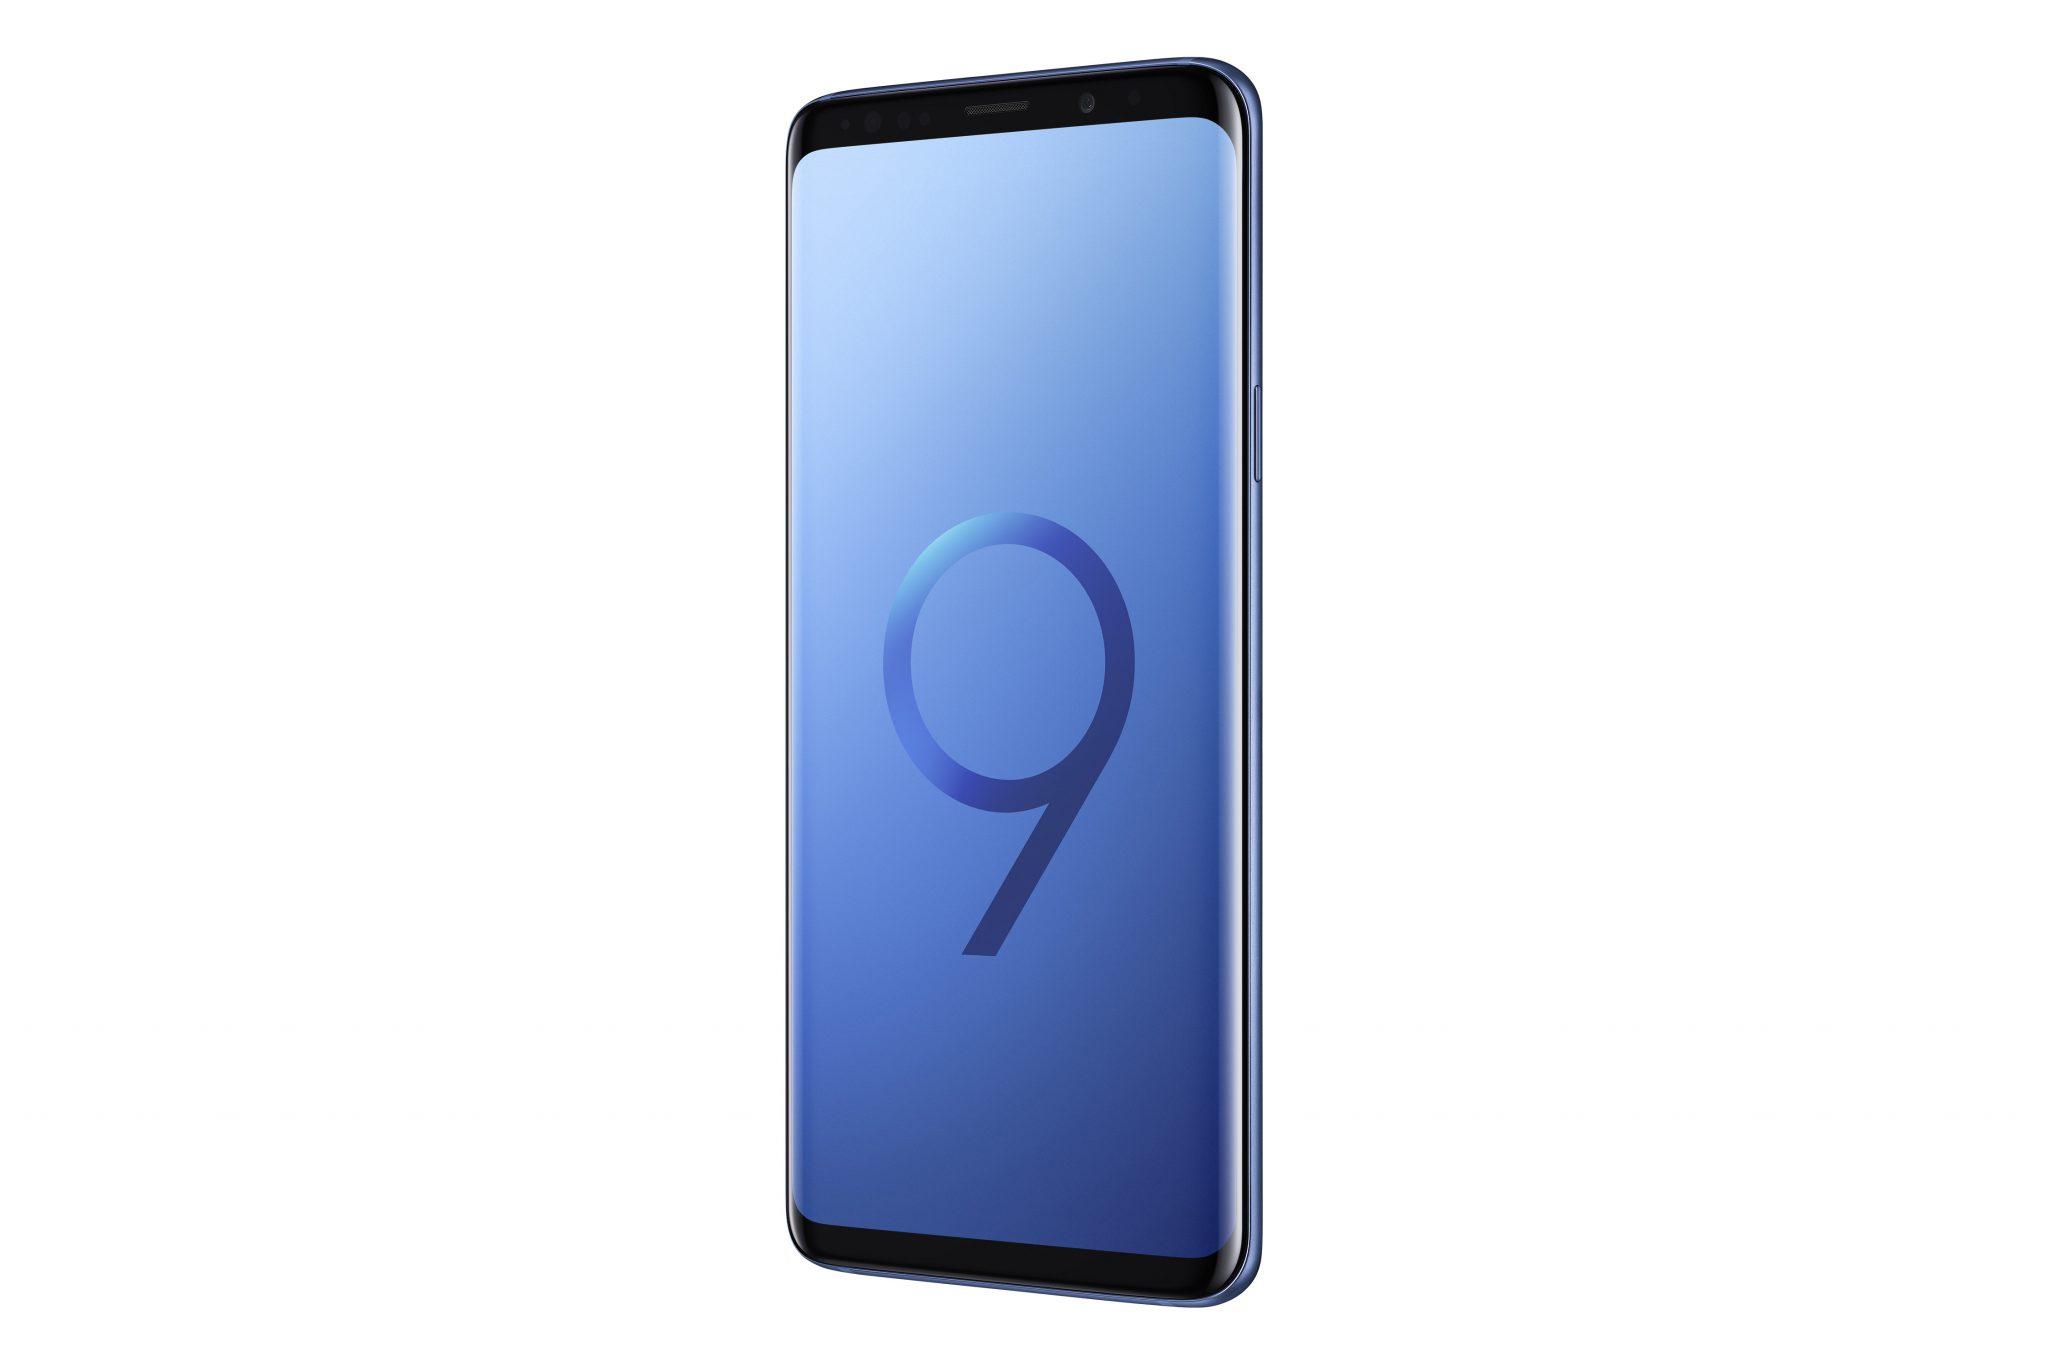 SM G965 GalaxyS9Plus R30 Blue - SM_G965_GalaxyS9Plus_R30_Blue